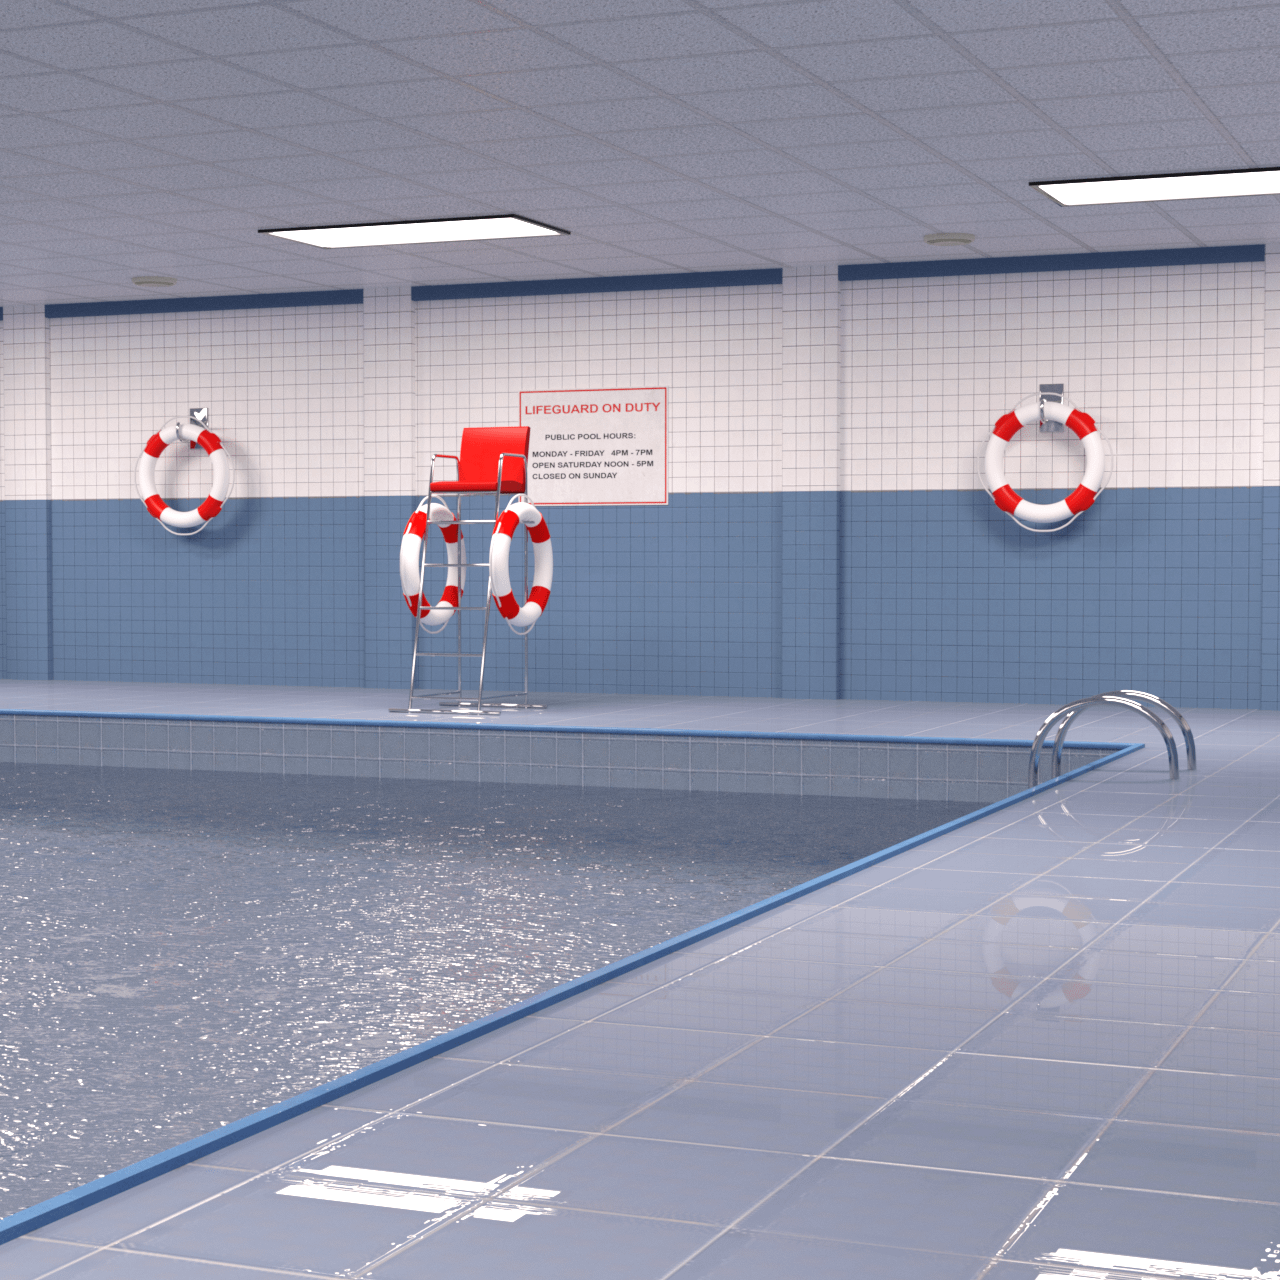 Alternative camera perspective of the public indoor pool 3d model